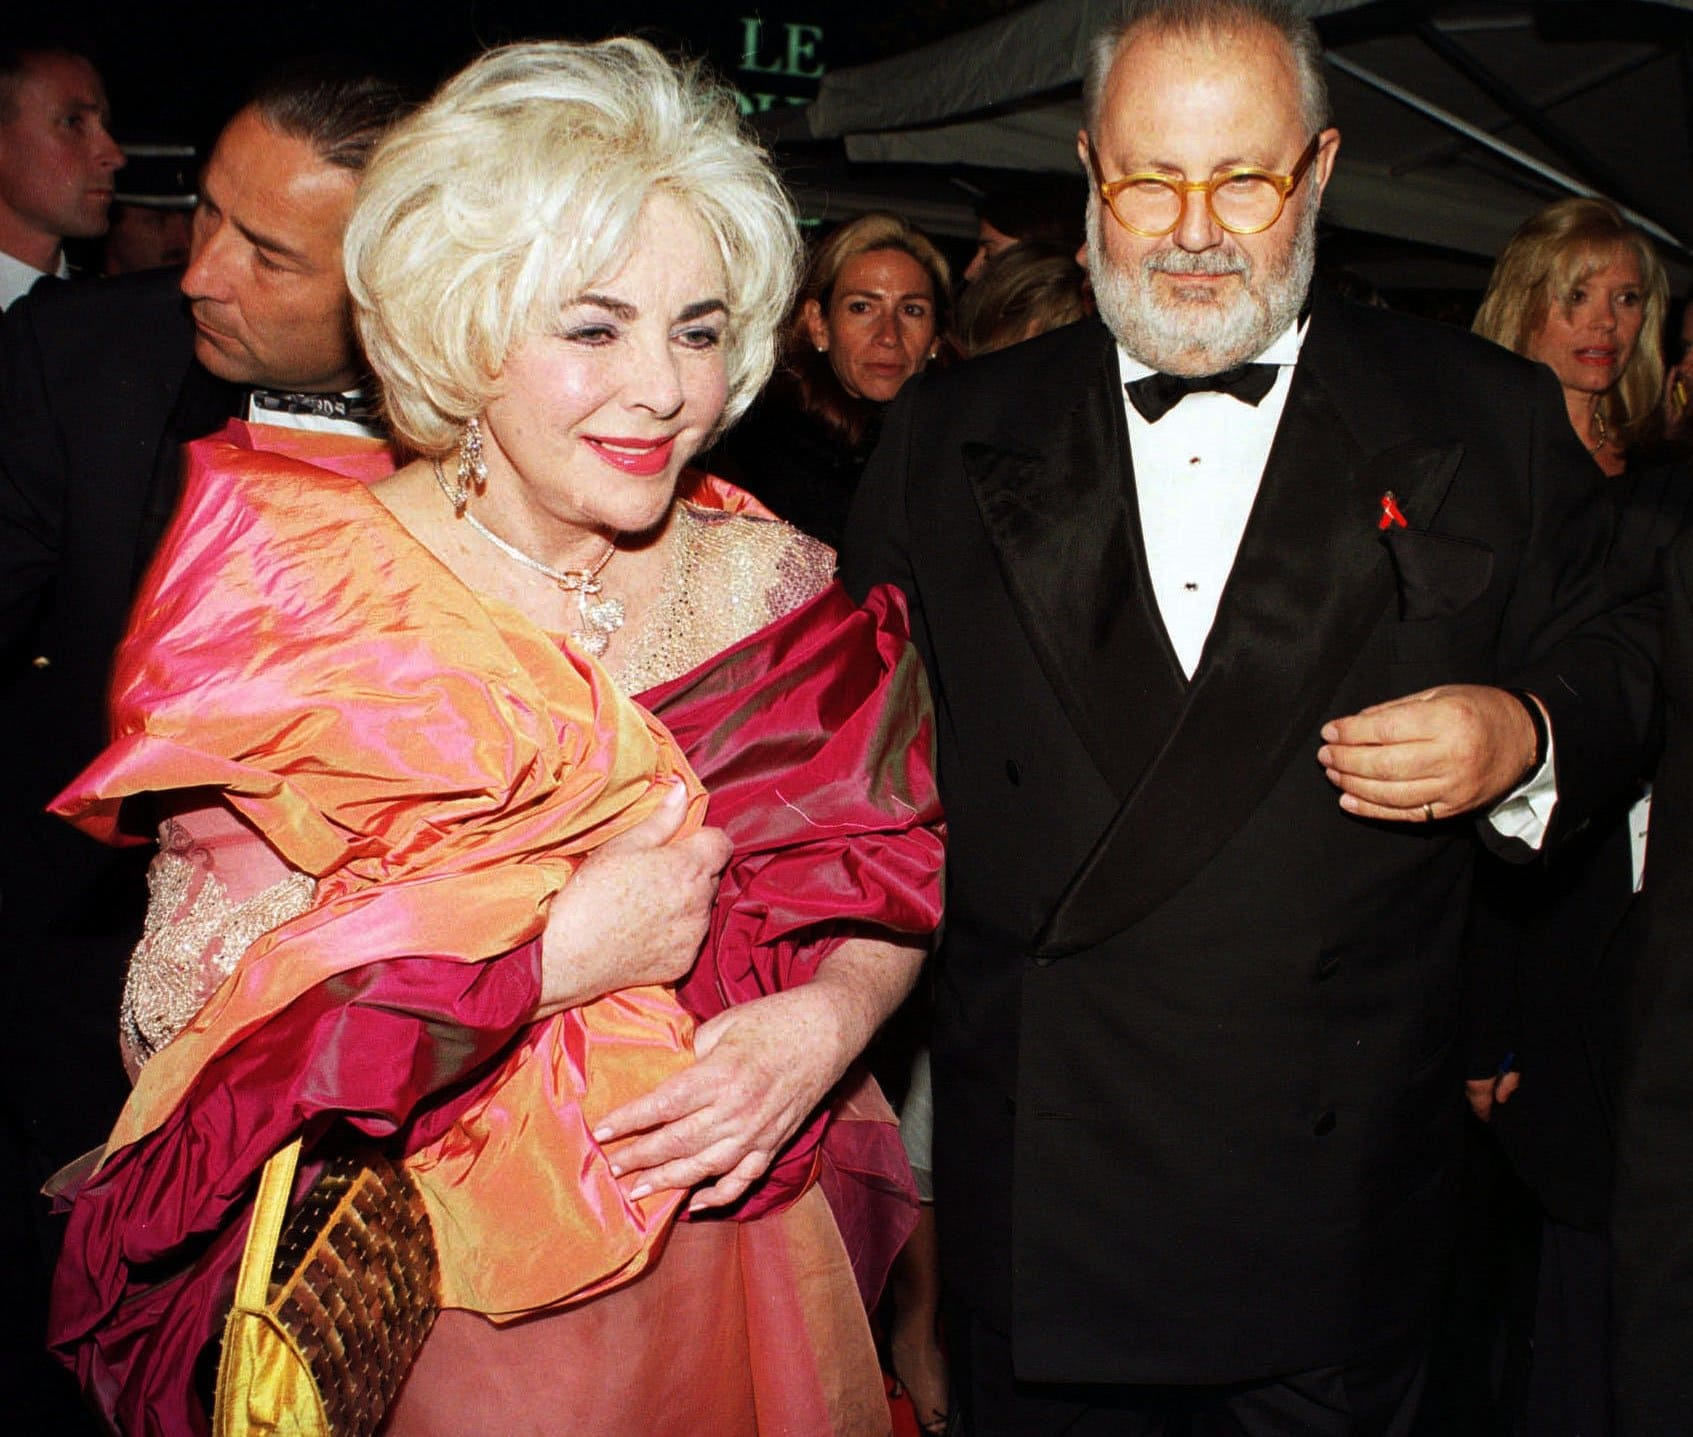 Italian fashion designer Gianfranco Ferré and Dame Elizabeth Rosemond Taylor DBE attend the amfAR Gala Cannes in 1999